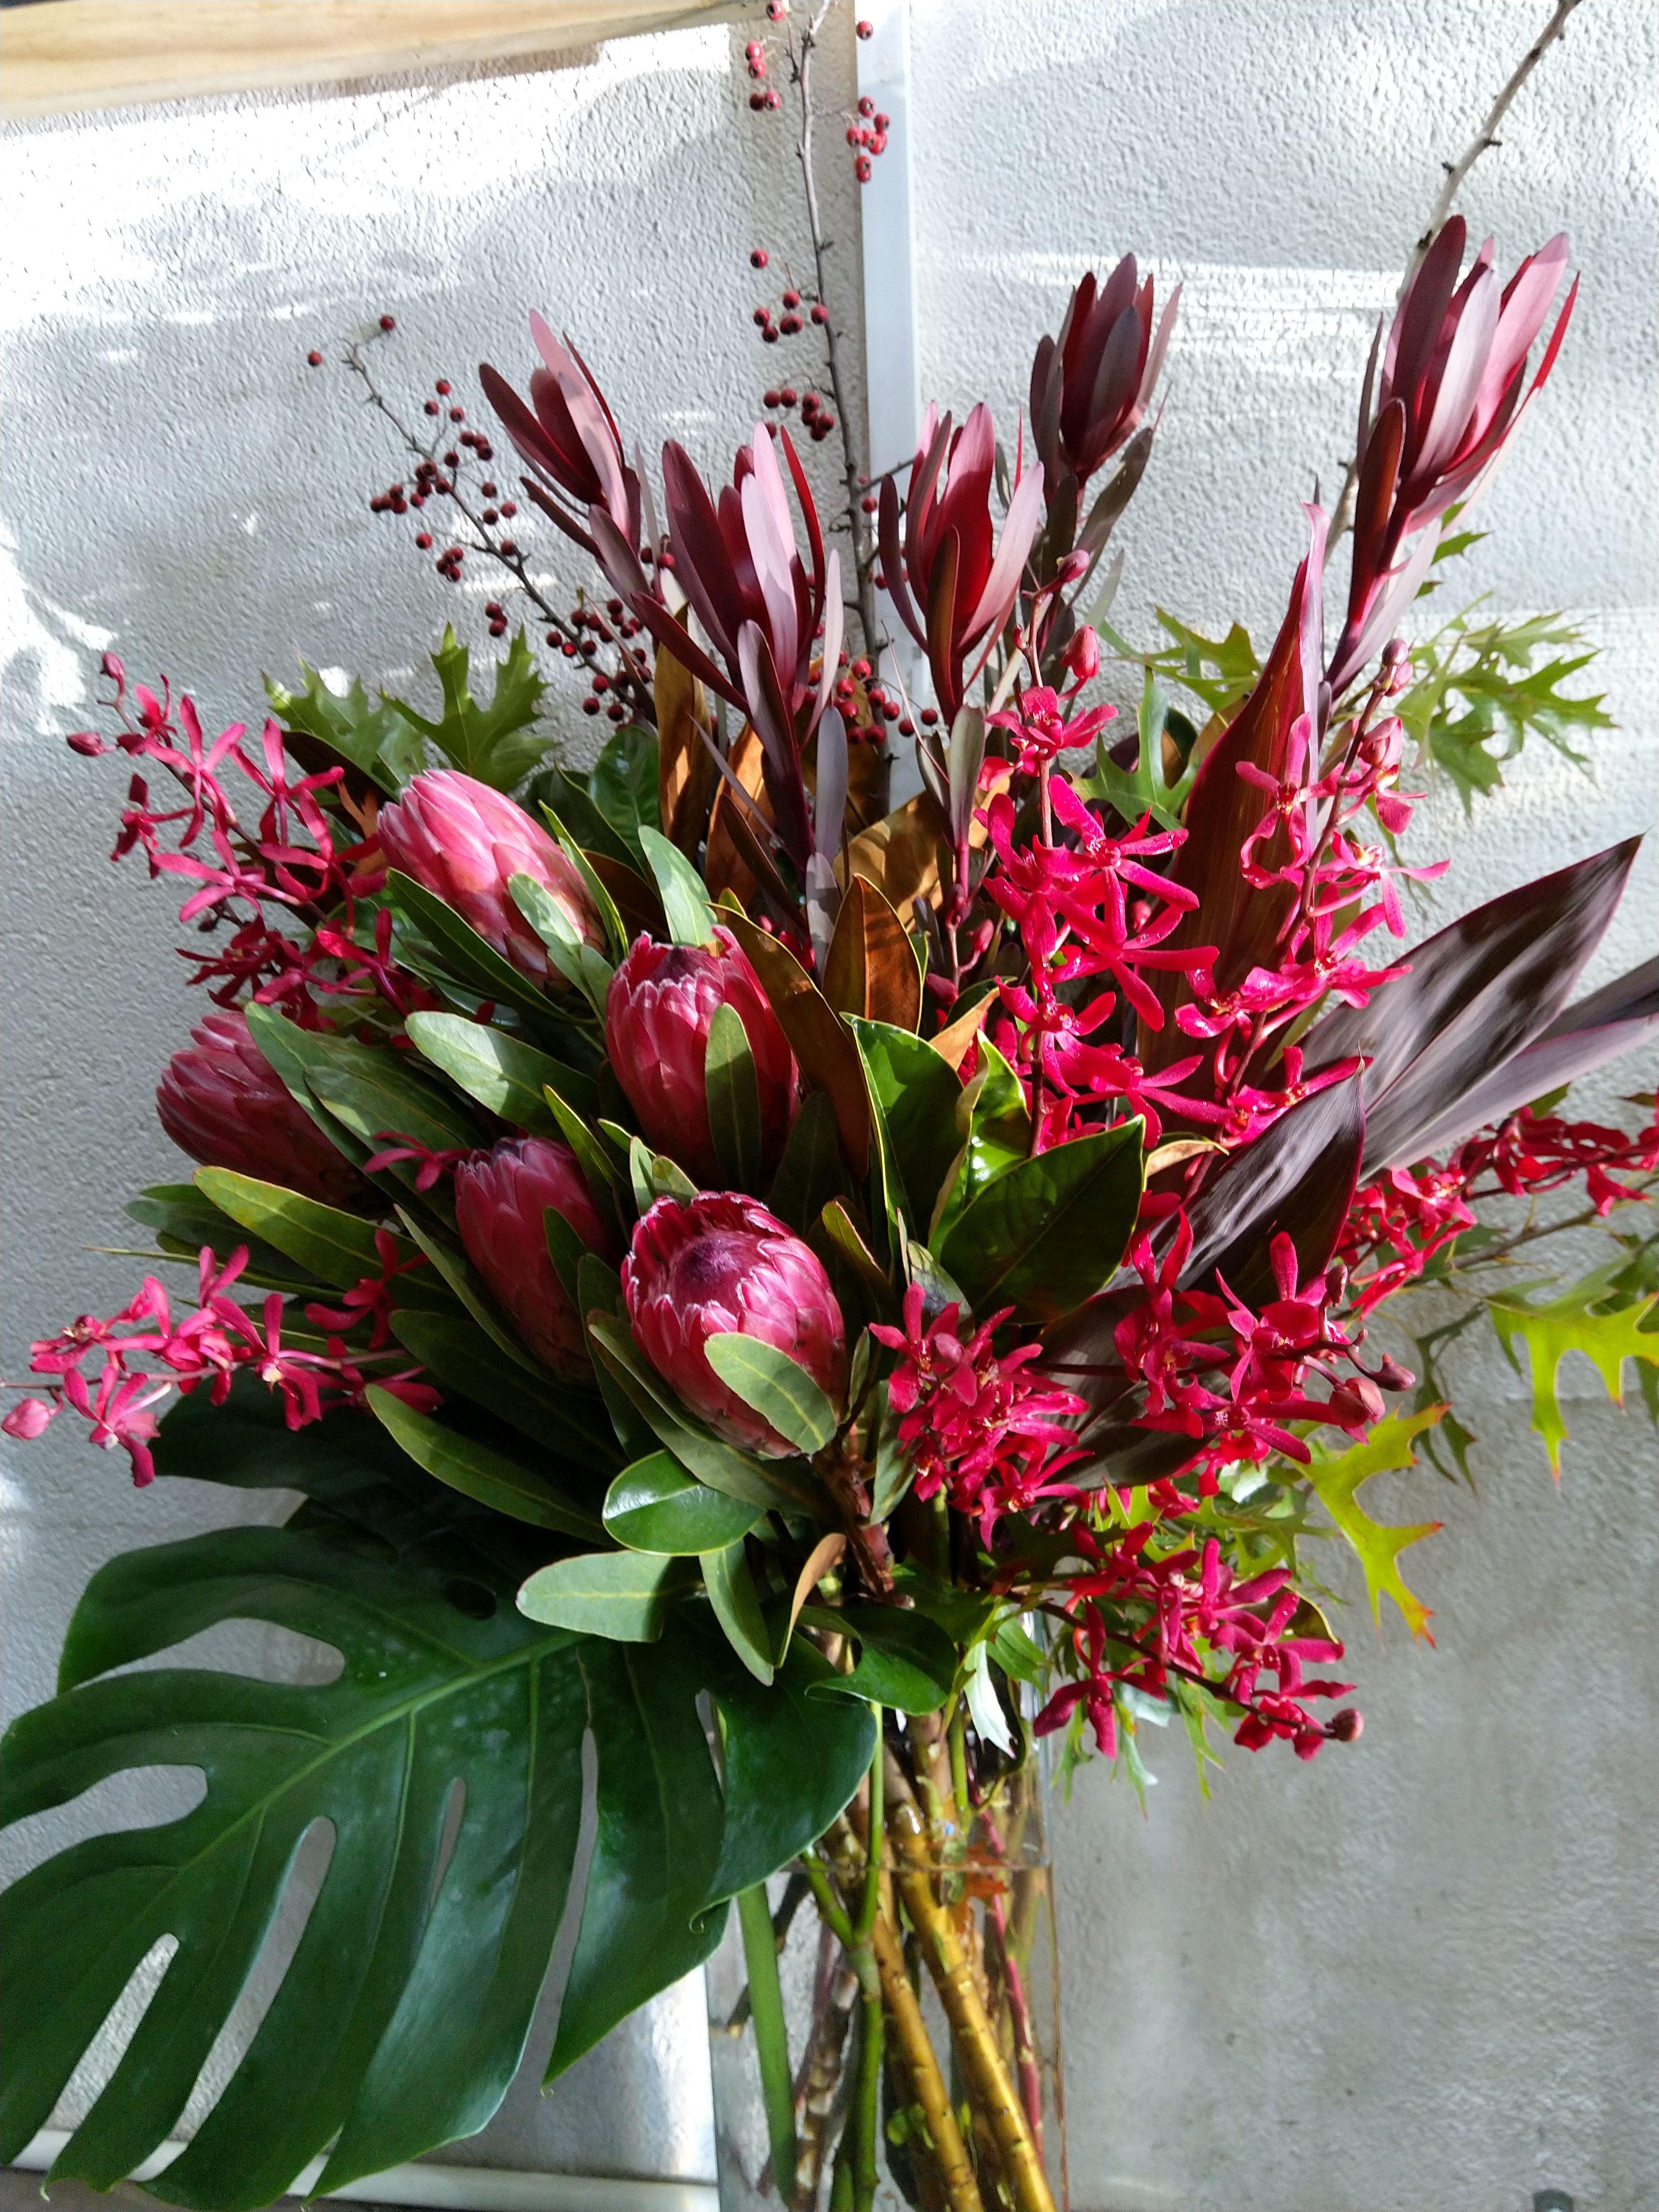 What A Beauty Flower Of Protea Australian Native Flowers Flower Beauty Flowers